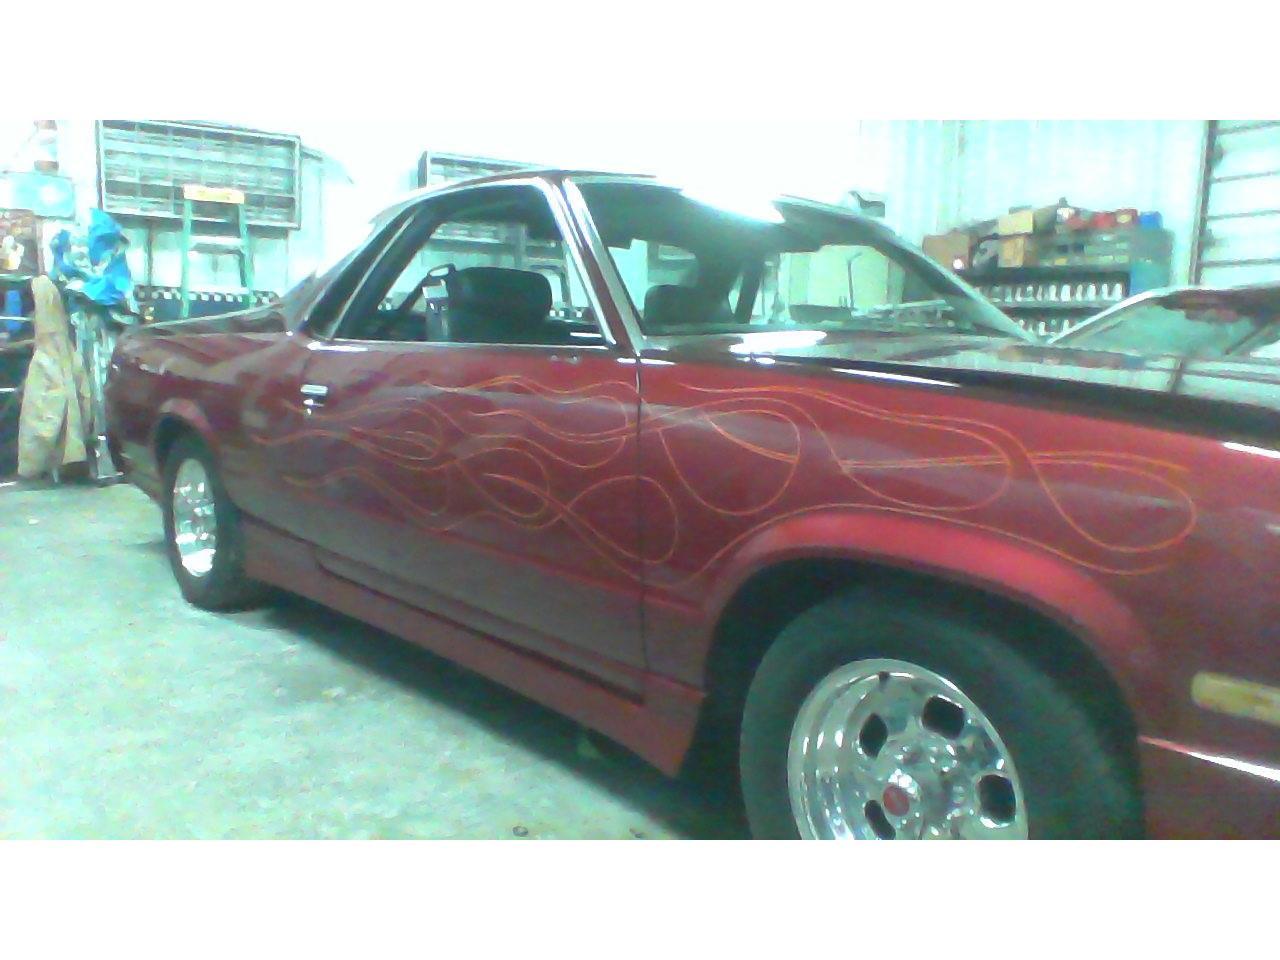 1983 Chevrolet El Camino (CC-1196326) for sale in East Aurora, New York